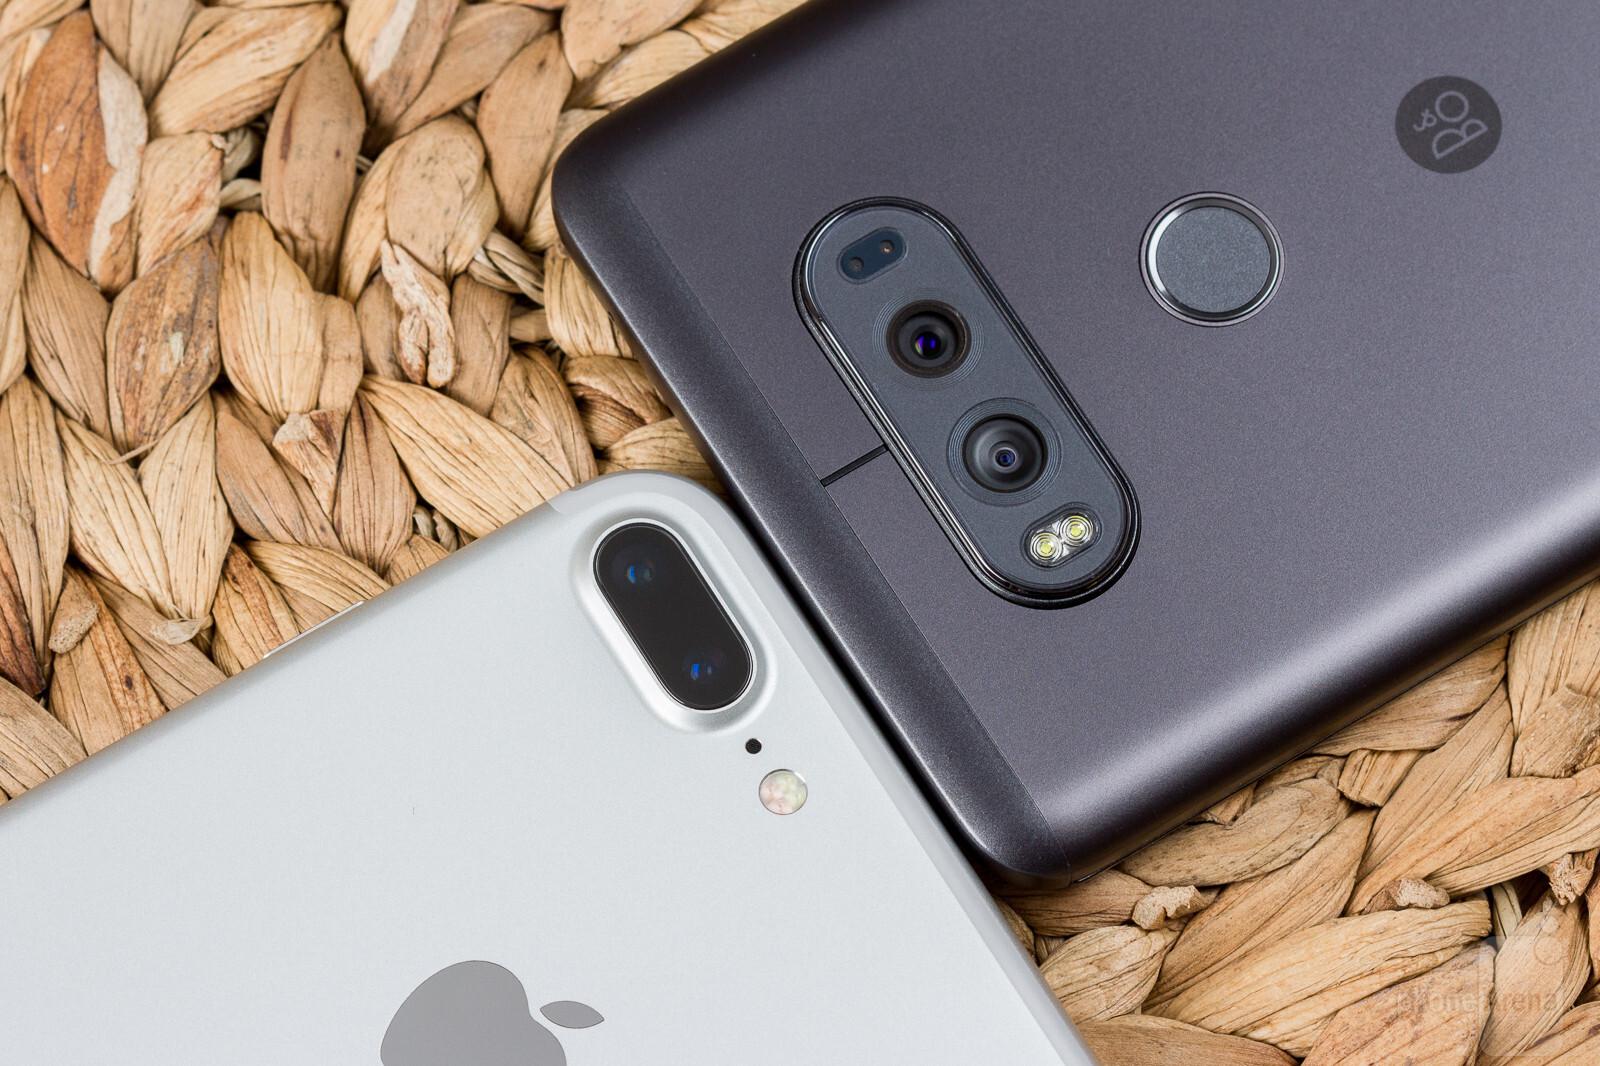 Apple iPhone 7 Plus vs LG V20 - Camera and Multimedia - PhoneArena